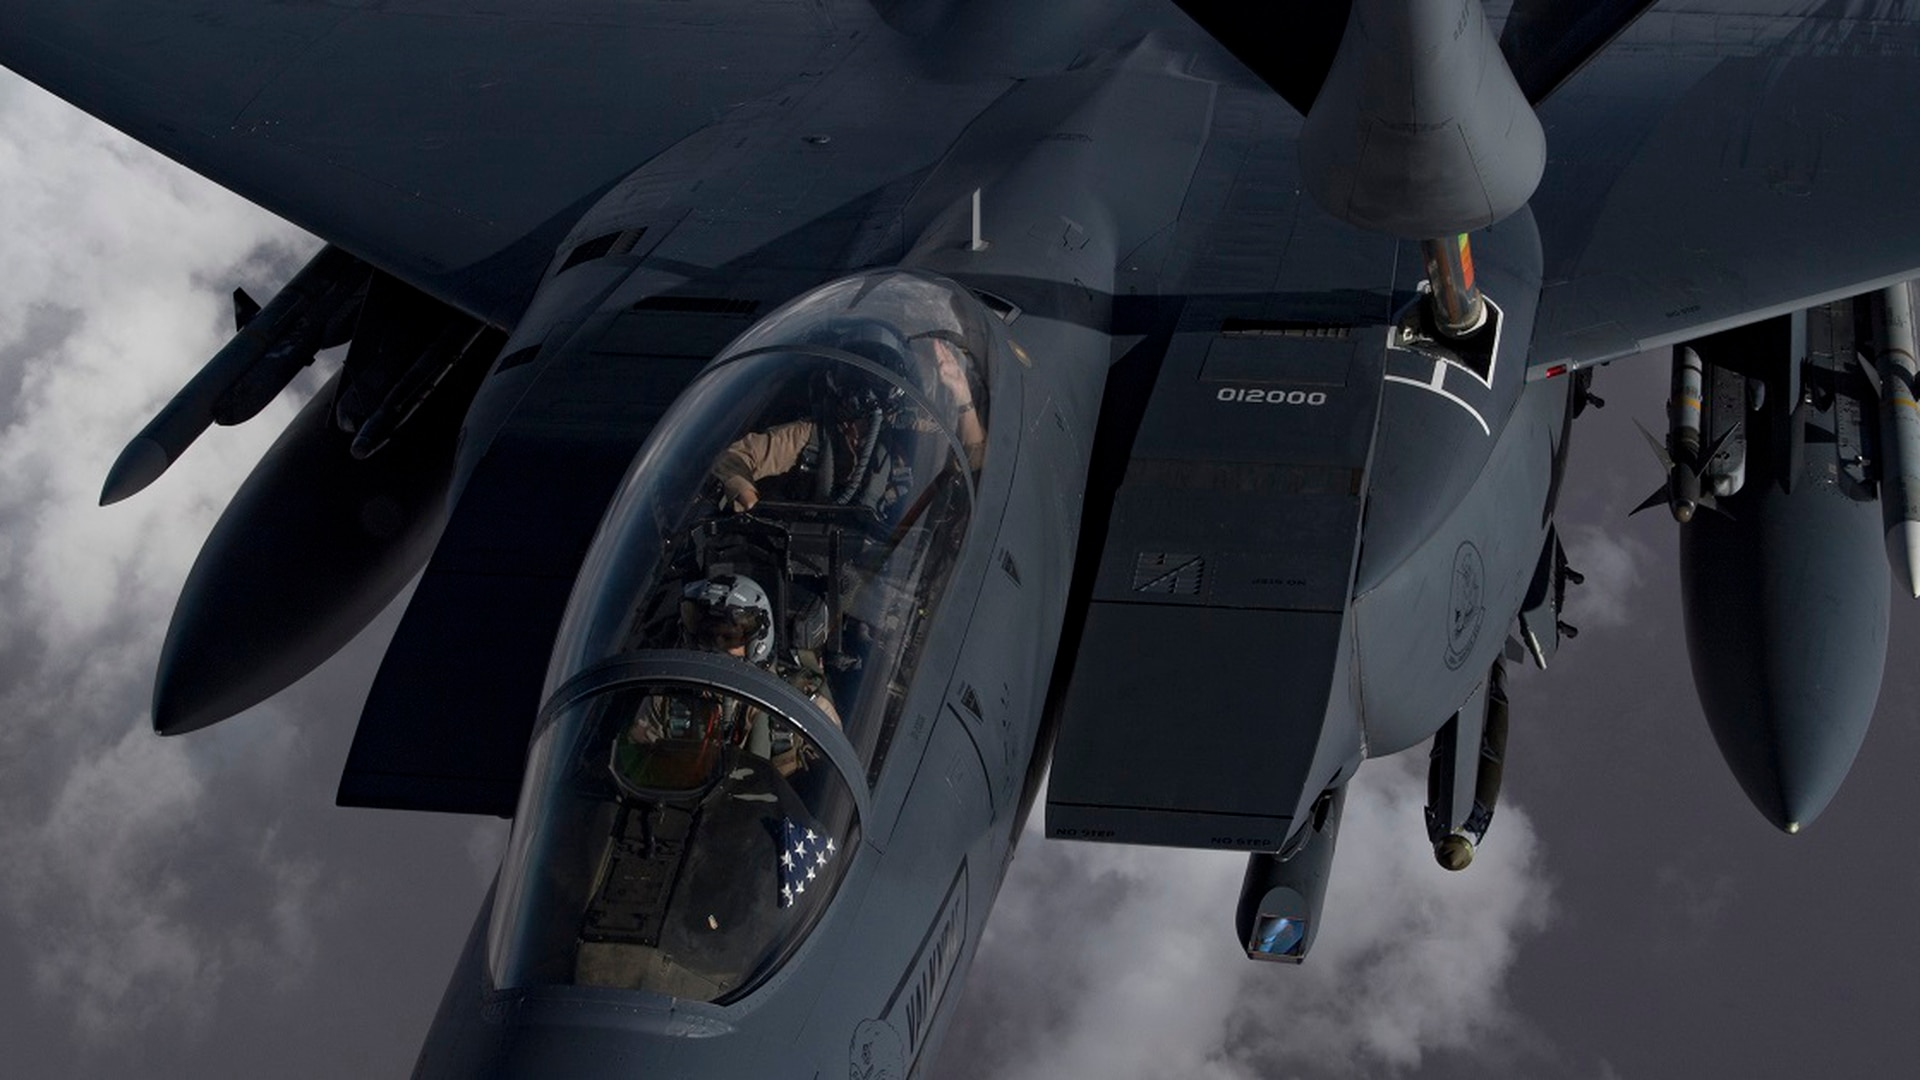 An Air Force F-15 Strike Eagle flies over northern Iraq Nov. 6. (Staff Sgt. Daniel Snider/Air Force)